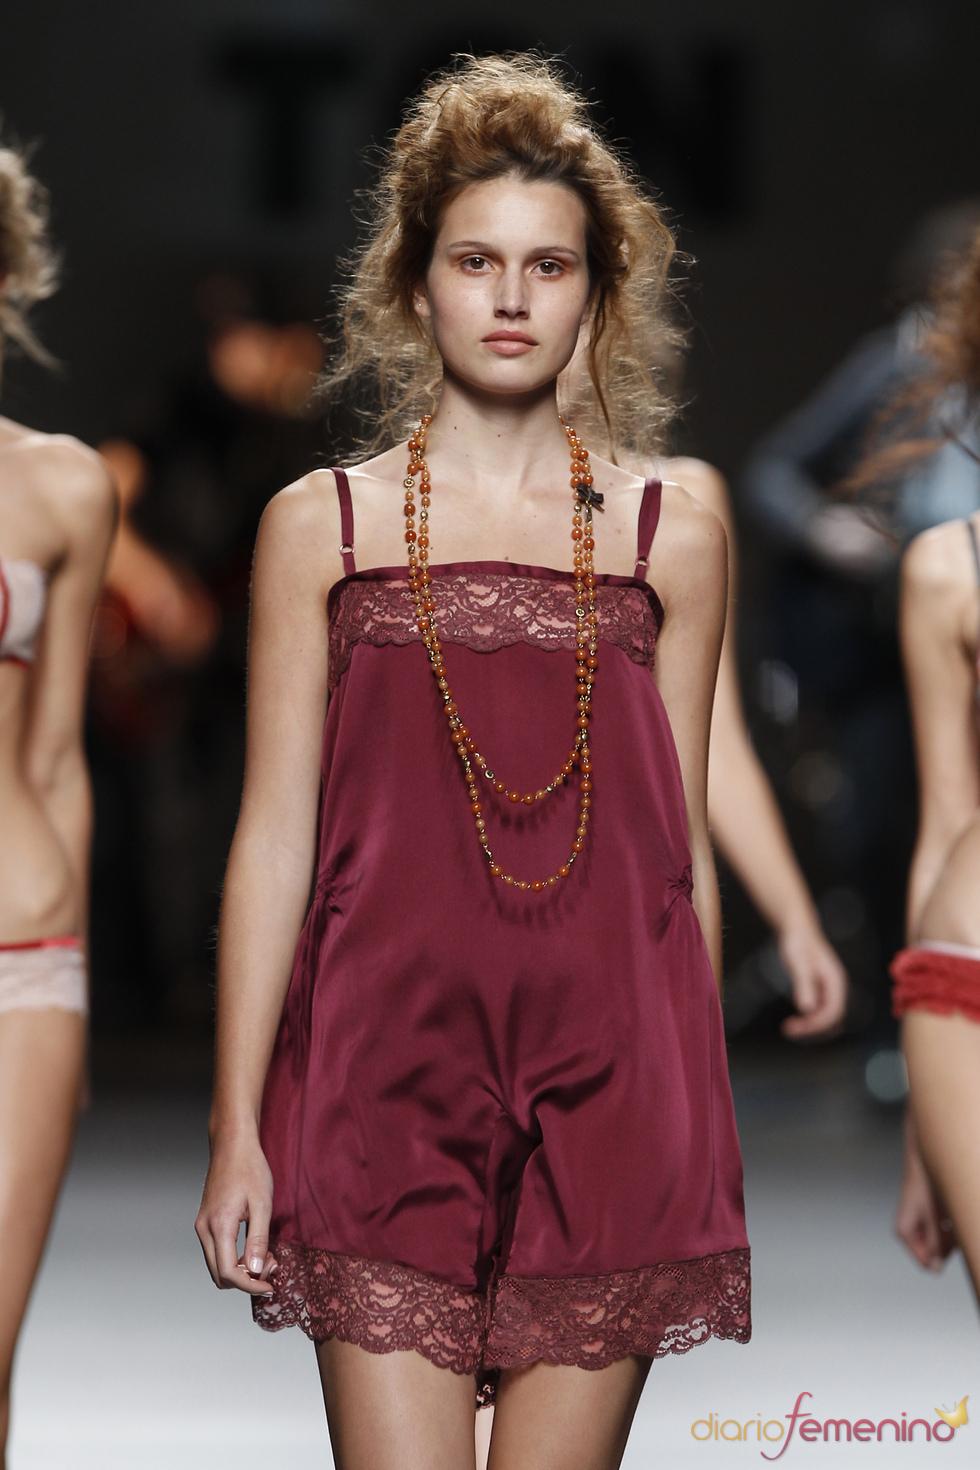 Camisón fucsia. TCN. Cibeles Madrid Fashion Week 2011